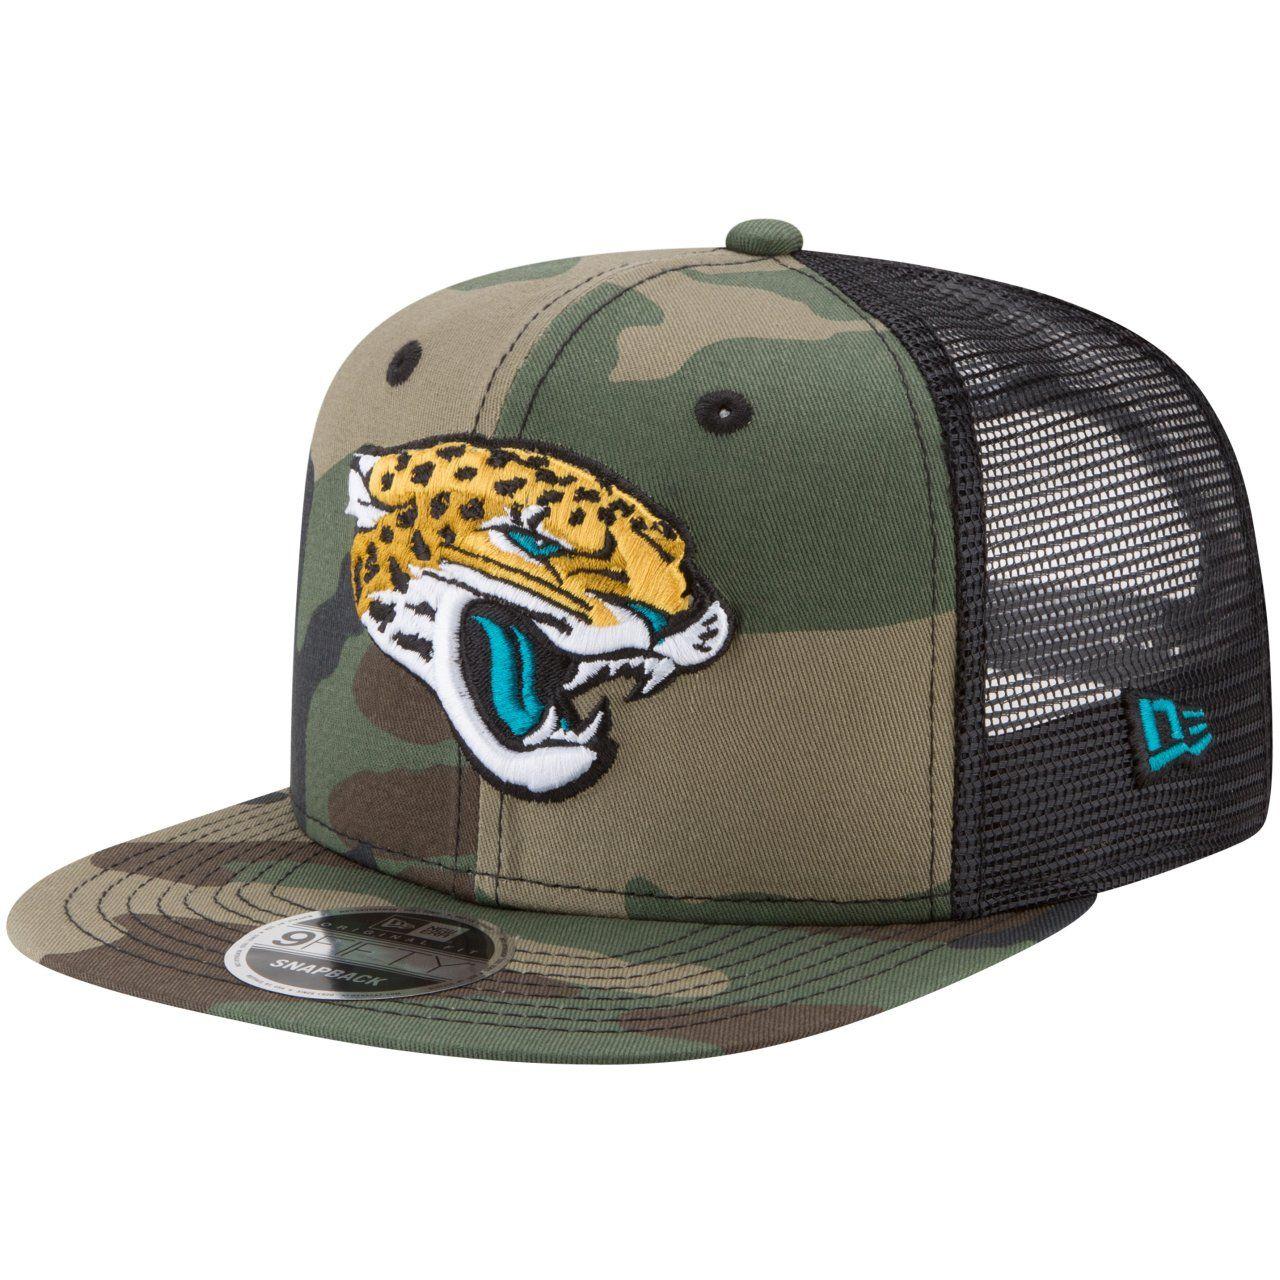 amfoo - New Era 9Fifty Mesh Snapback Cap Jacksonville Jaguars wood